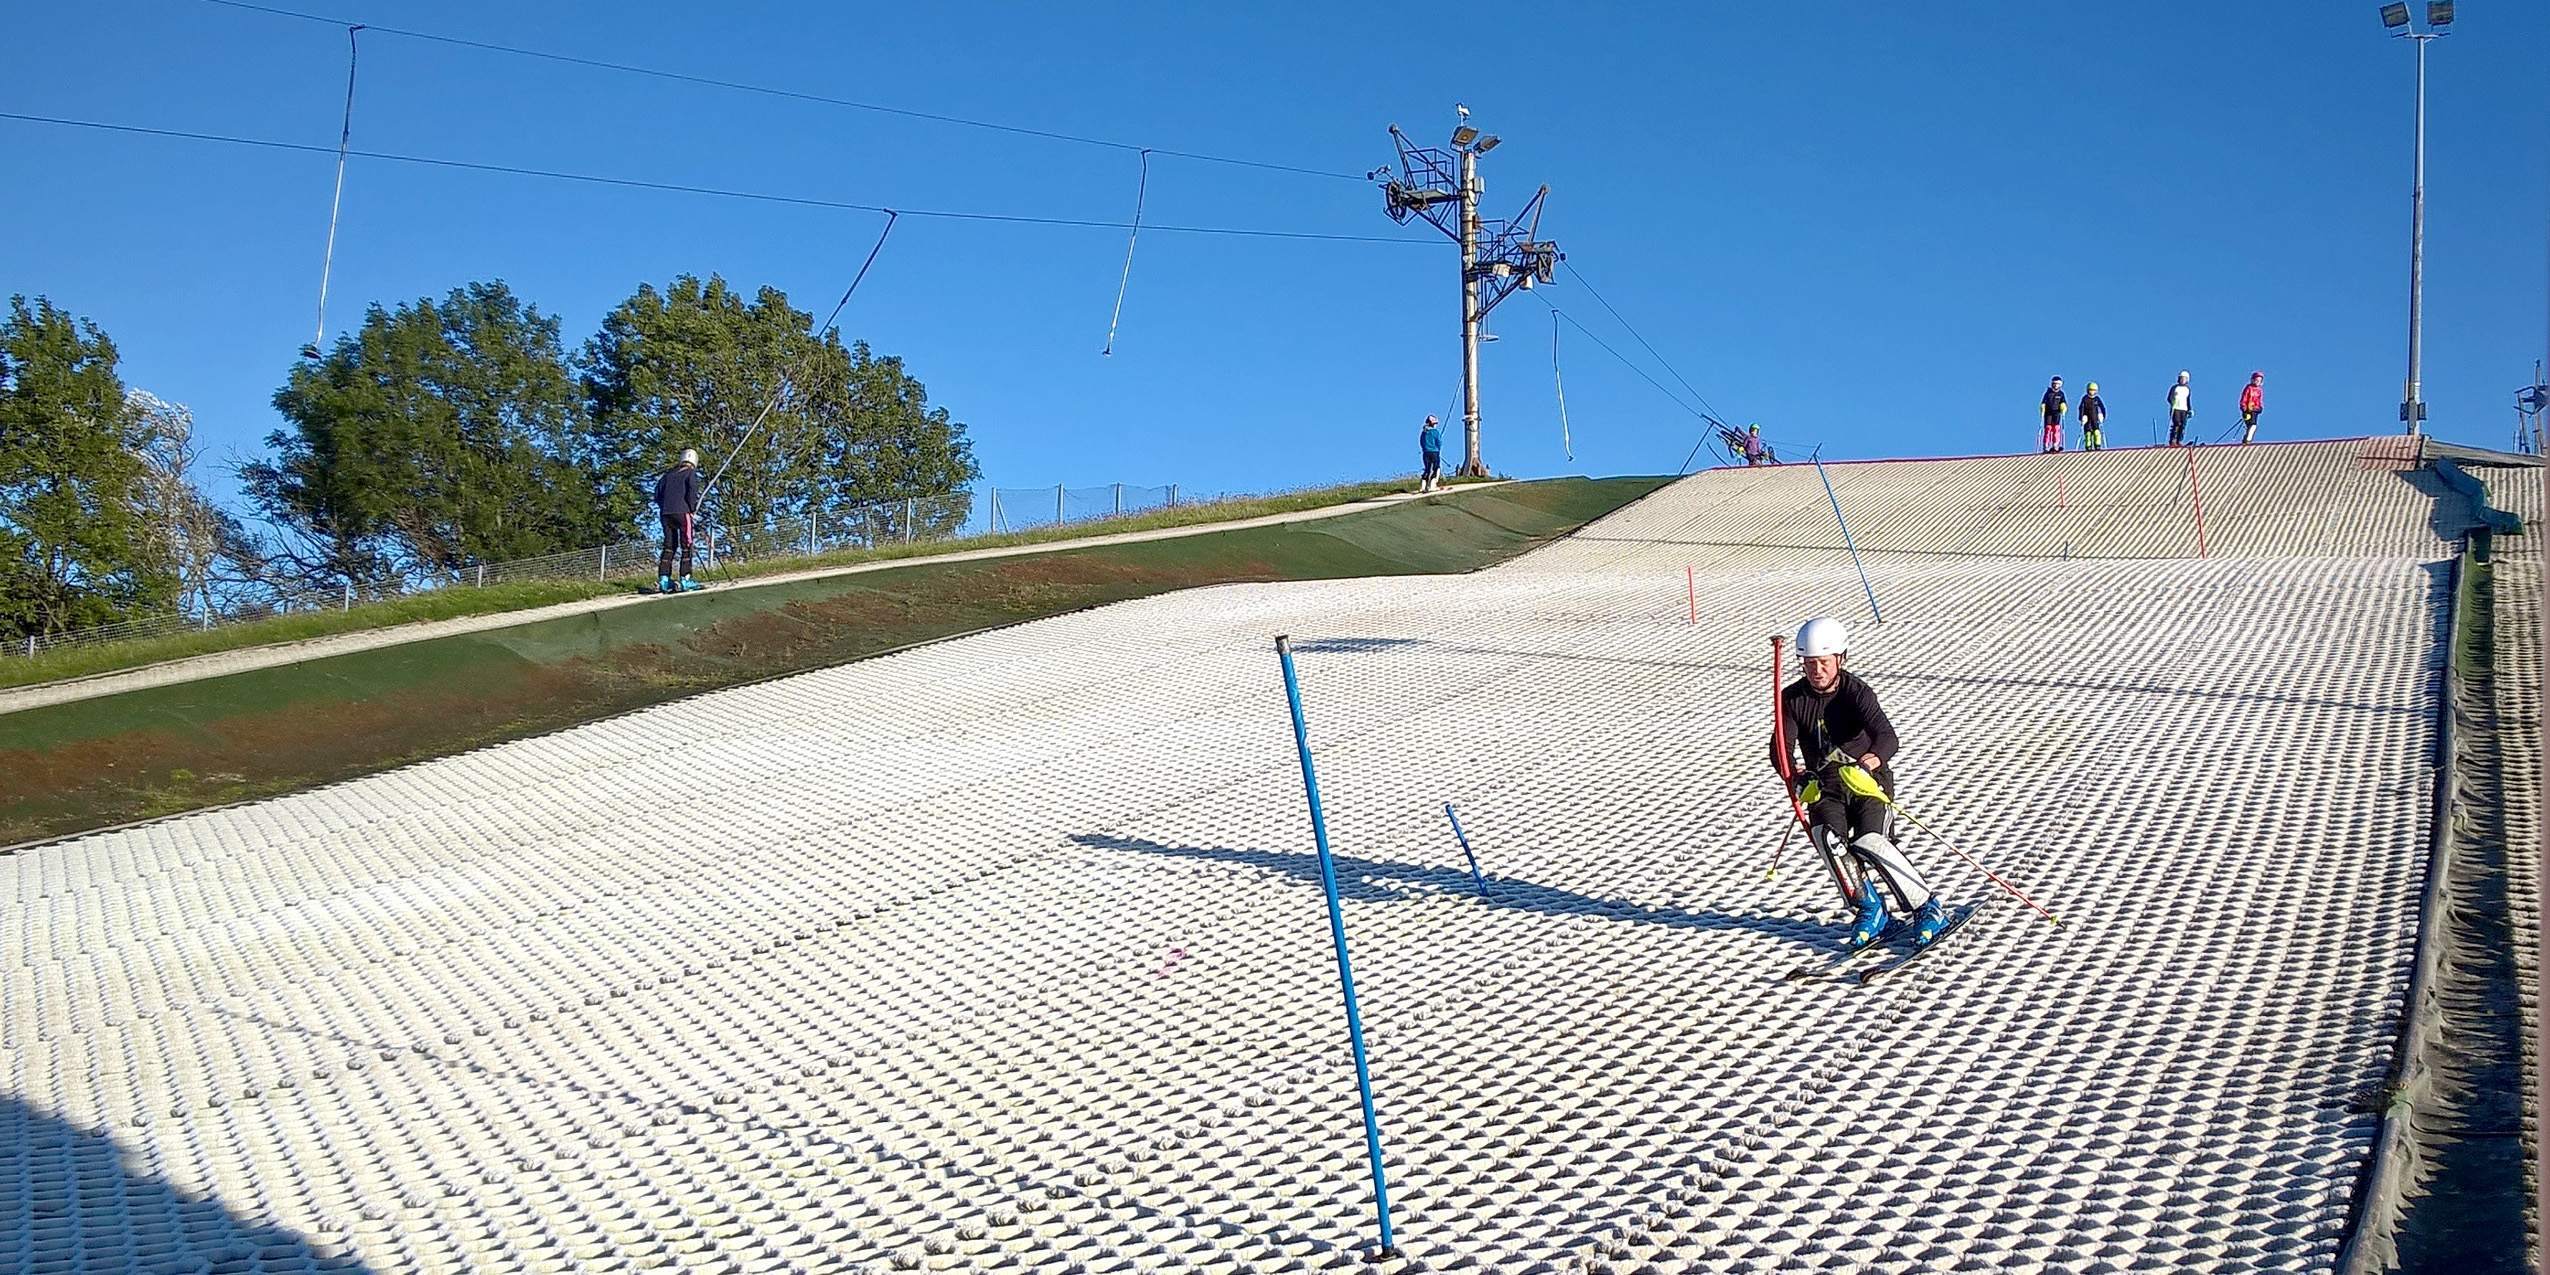 Snowsport Governance